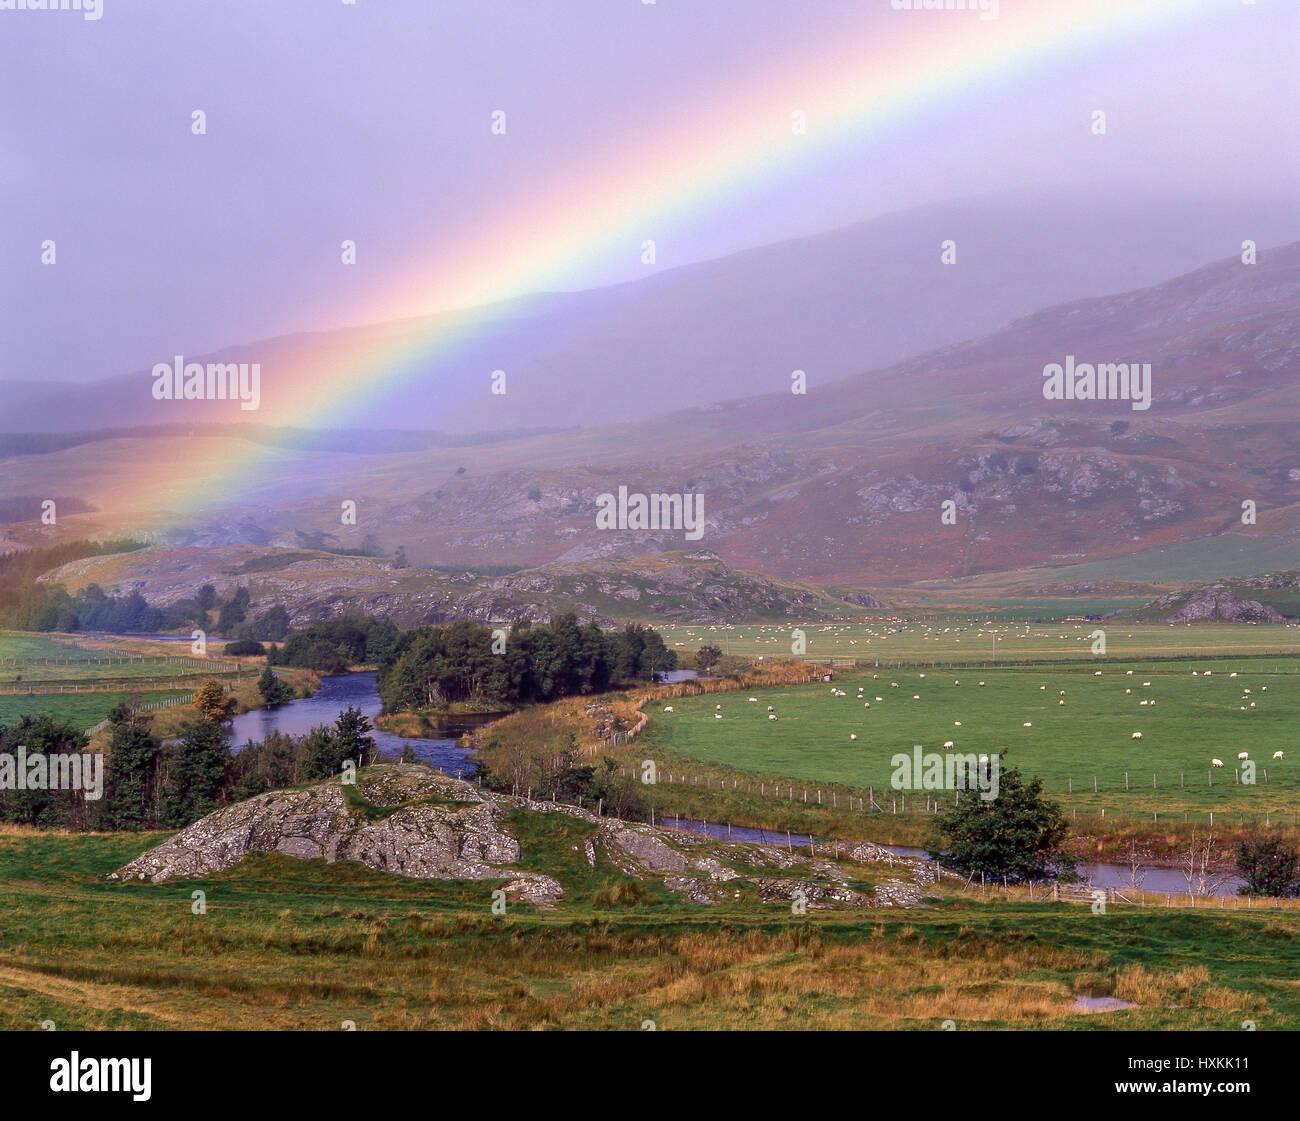 River scene with rainbow, Highland, Scotland, United Kingdom - Stock Image